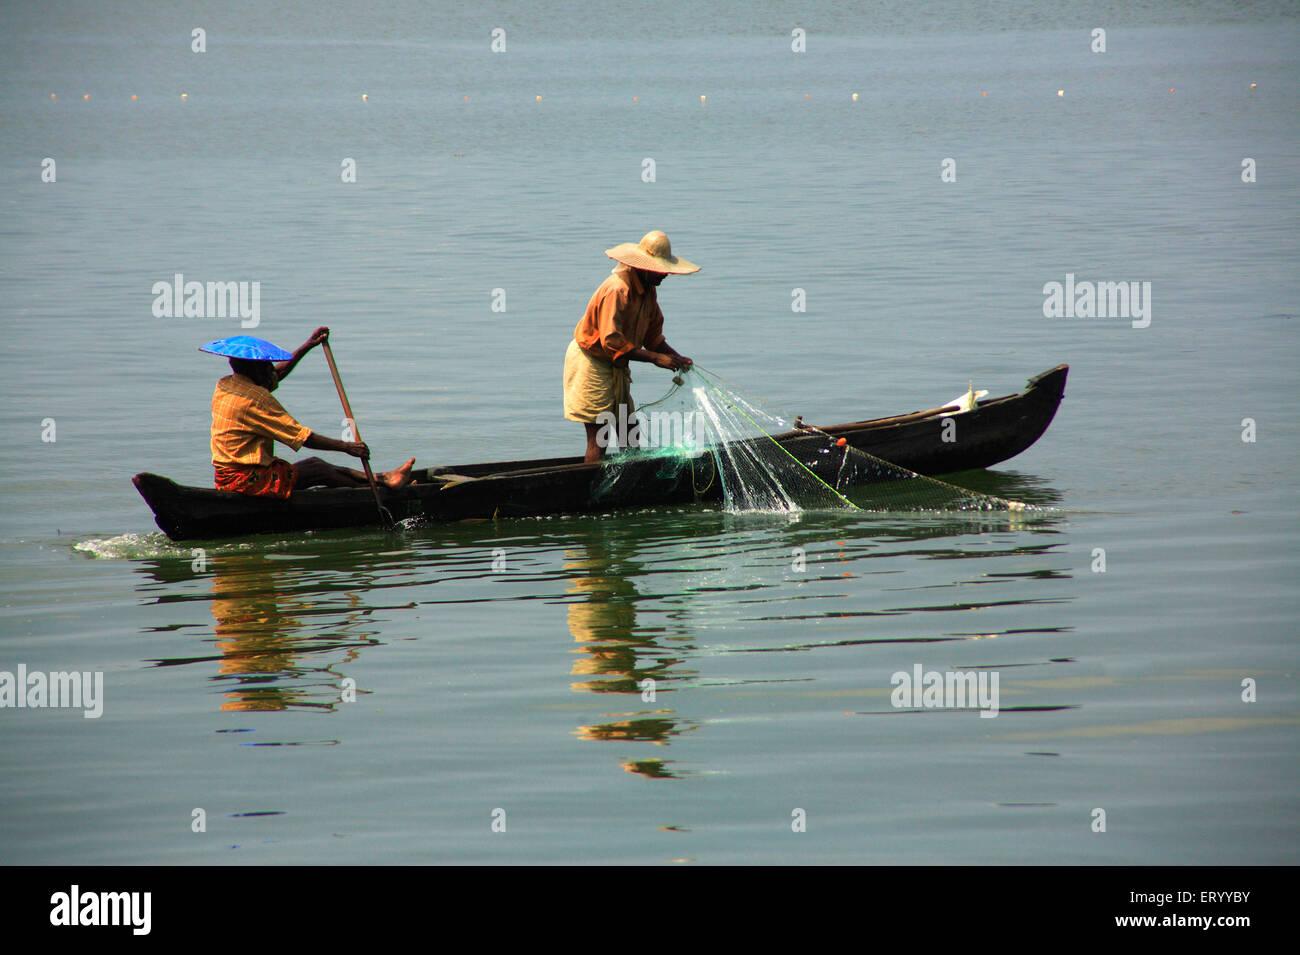 Fishing at Marinedrive ; Kochi Cochin ; Kerala ; India 3 September 2008 - Stock Image